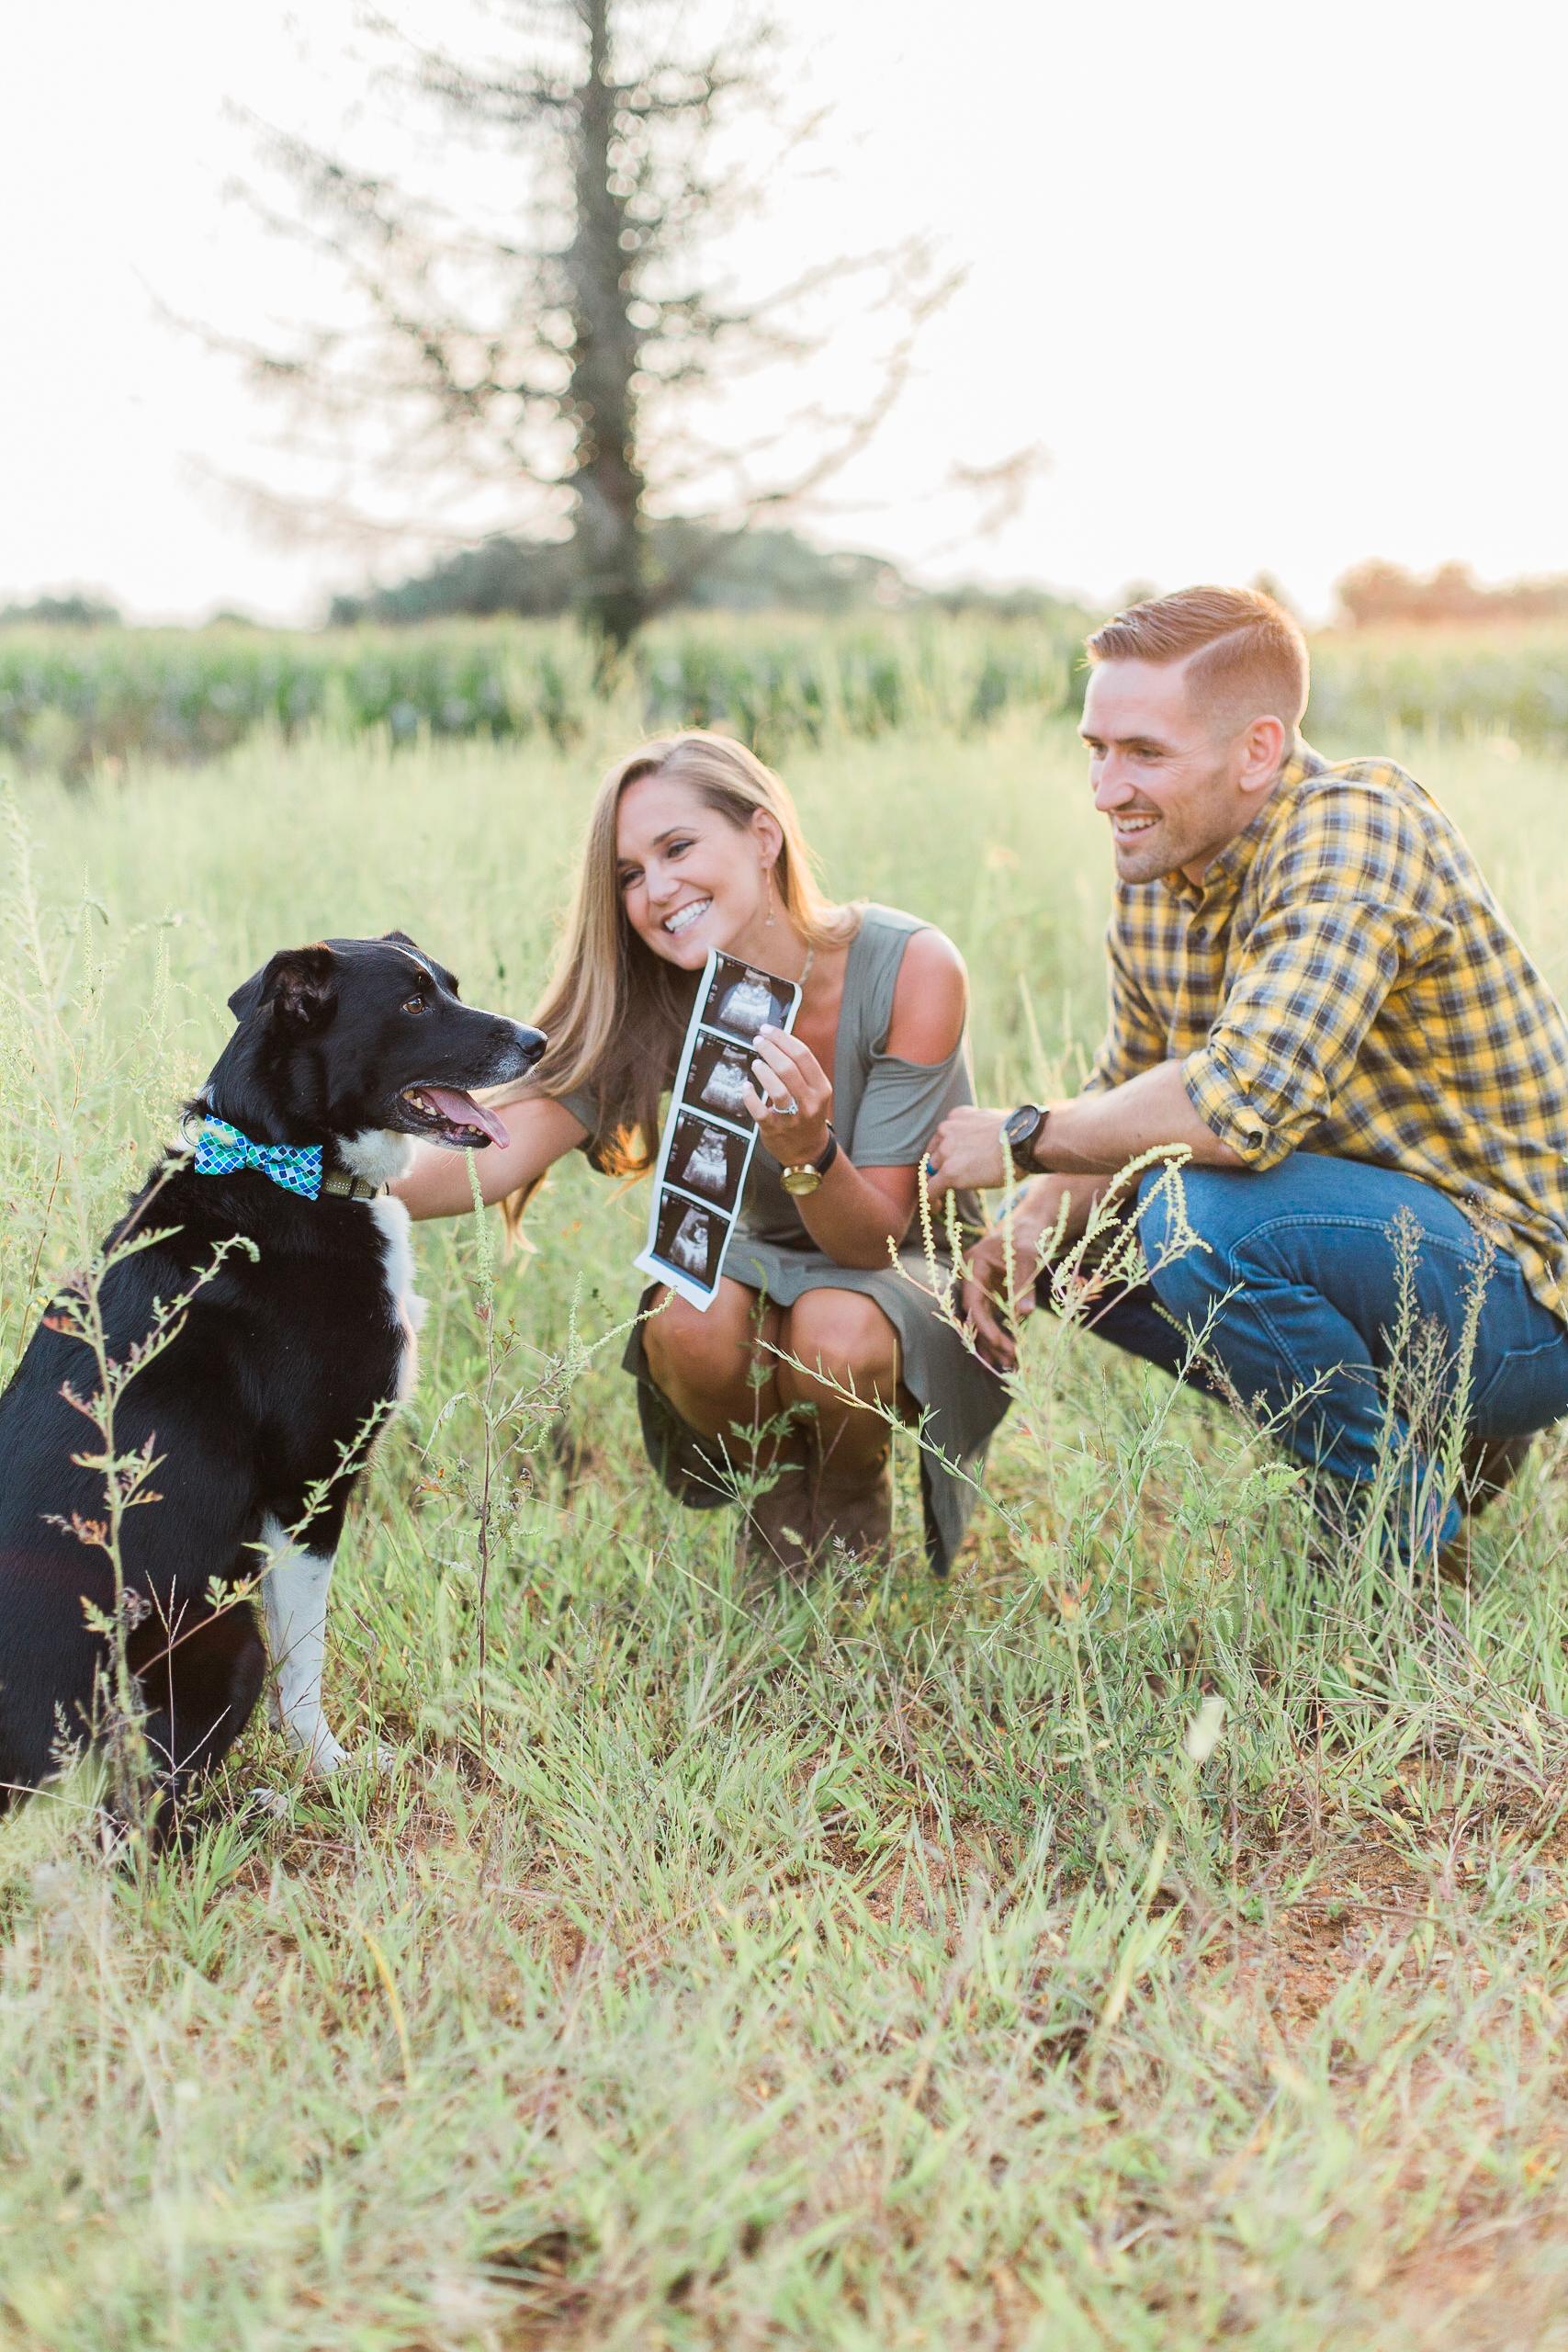 Meghan + Jesse Pregnancy Announcement-10.jpg